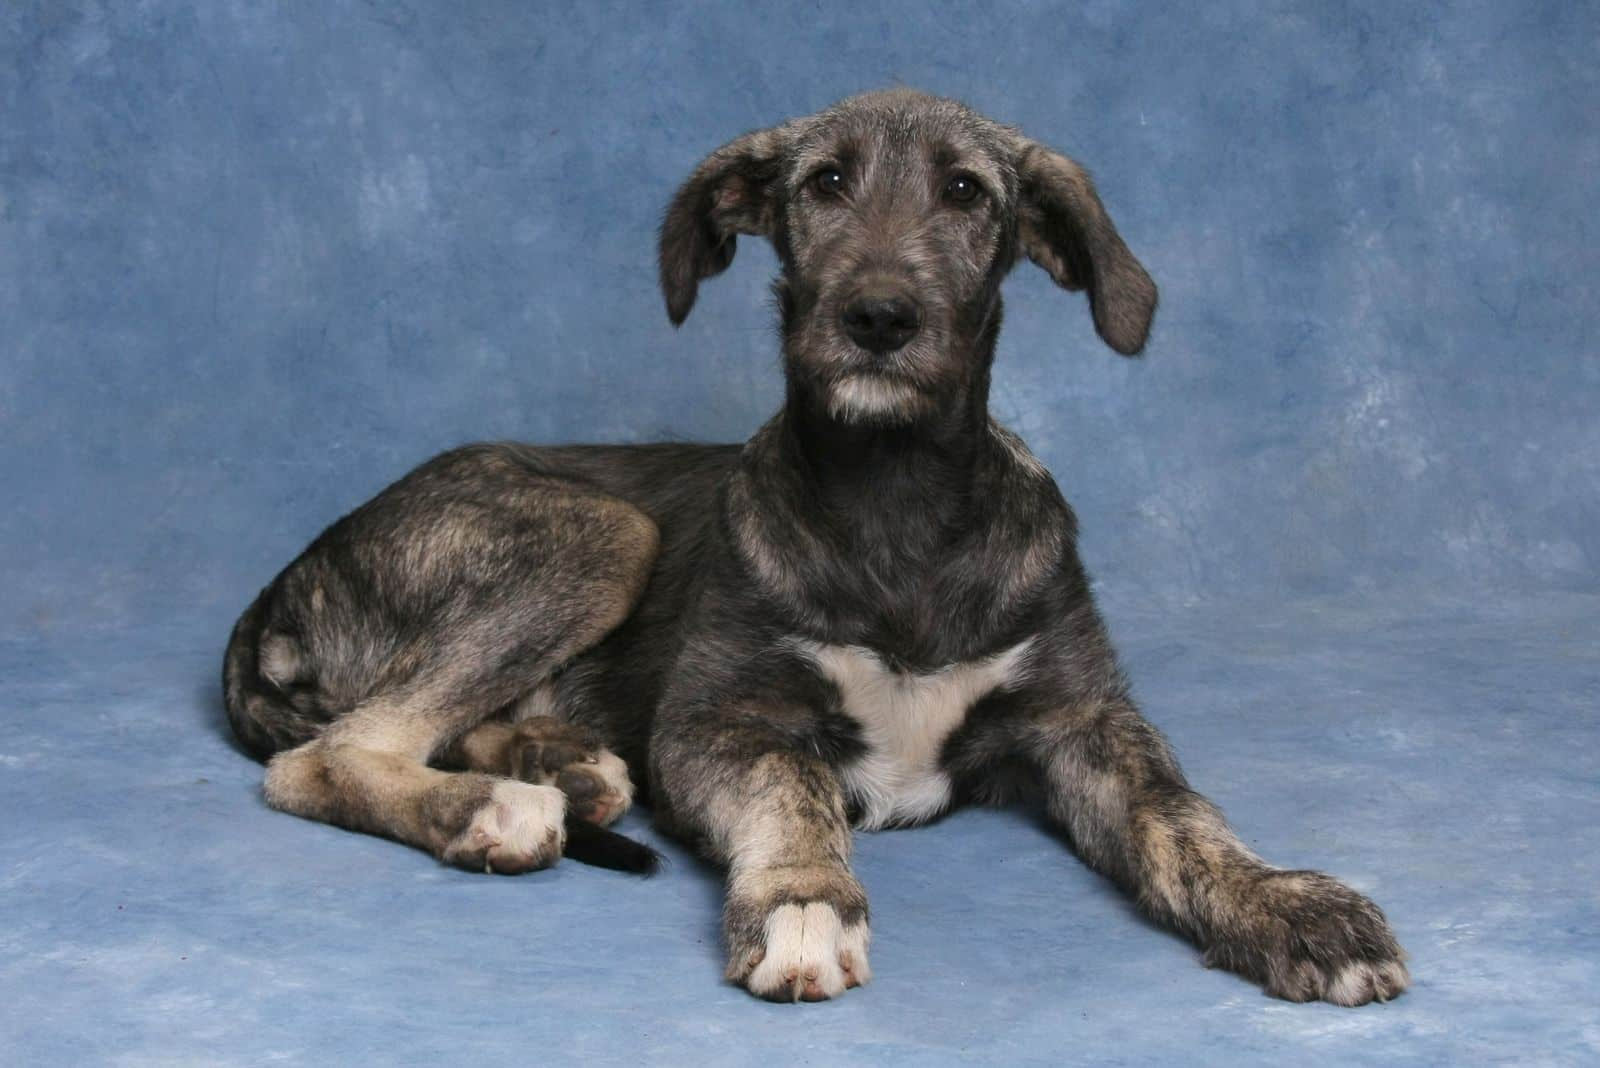 irish wolfhound puppy sitting in the studio with blue background